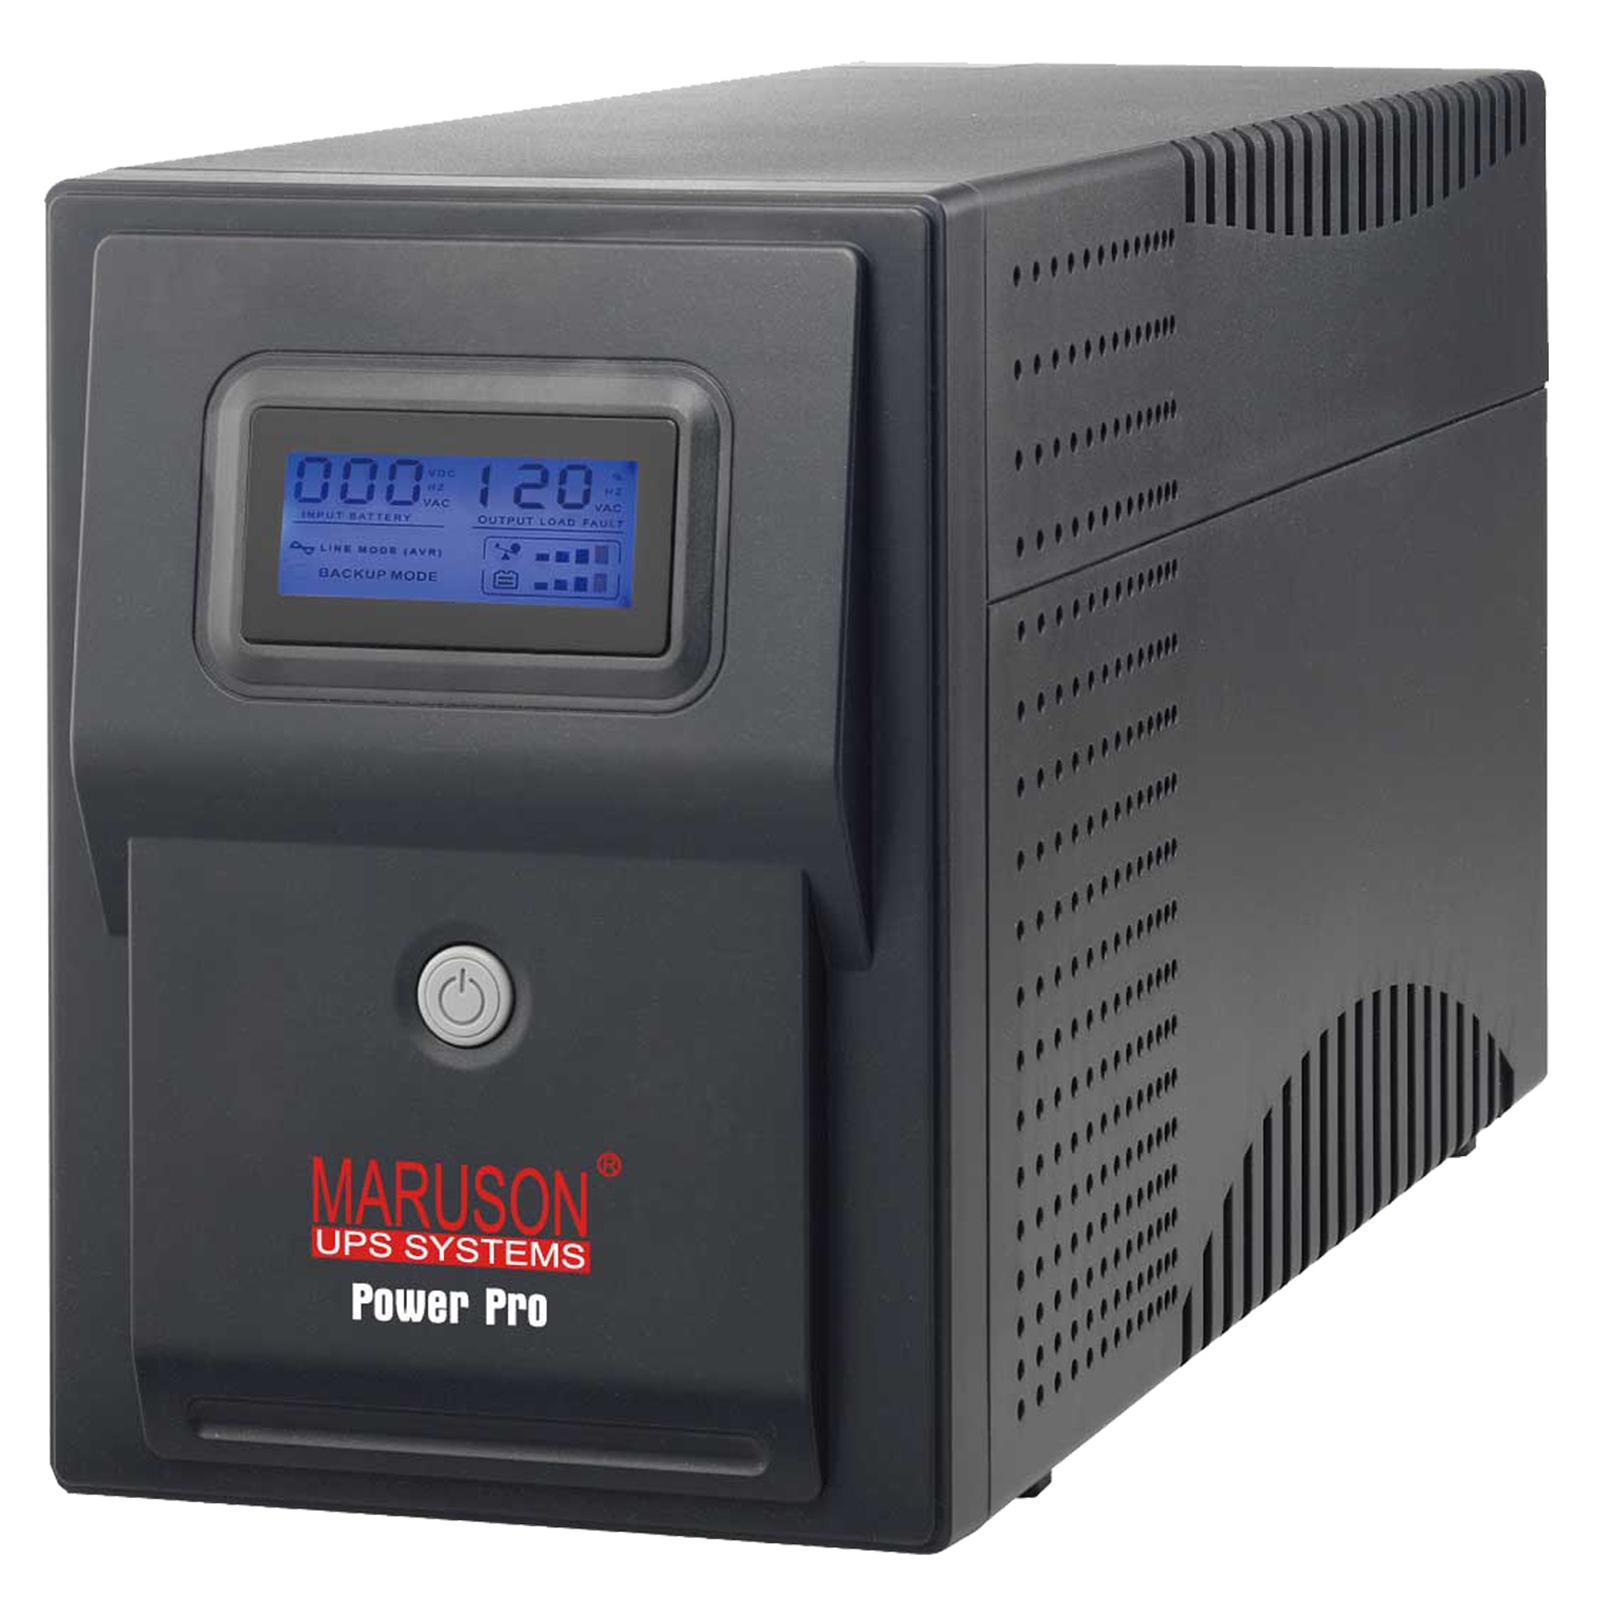 PowerPro 1500VA AVR LCD series line-interactive UPS